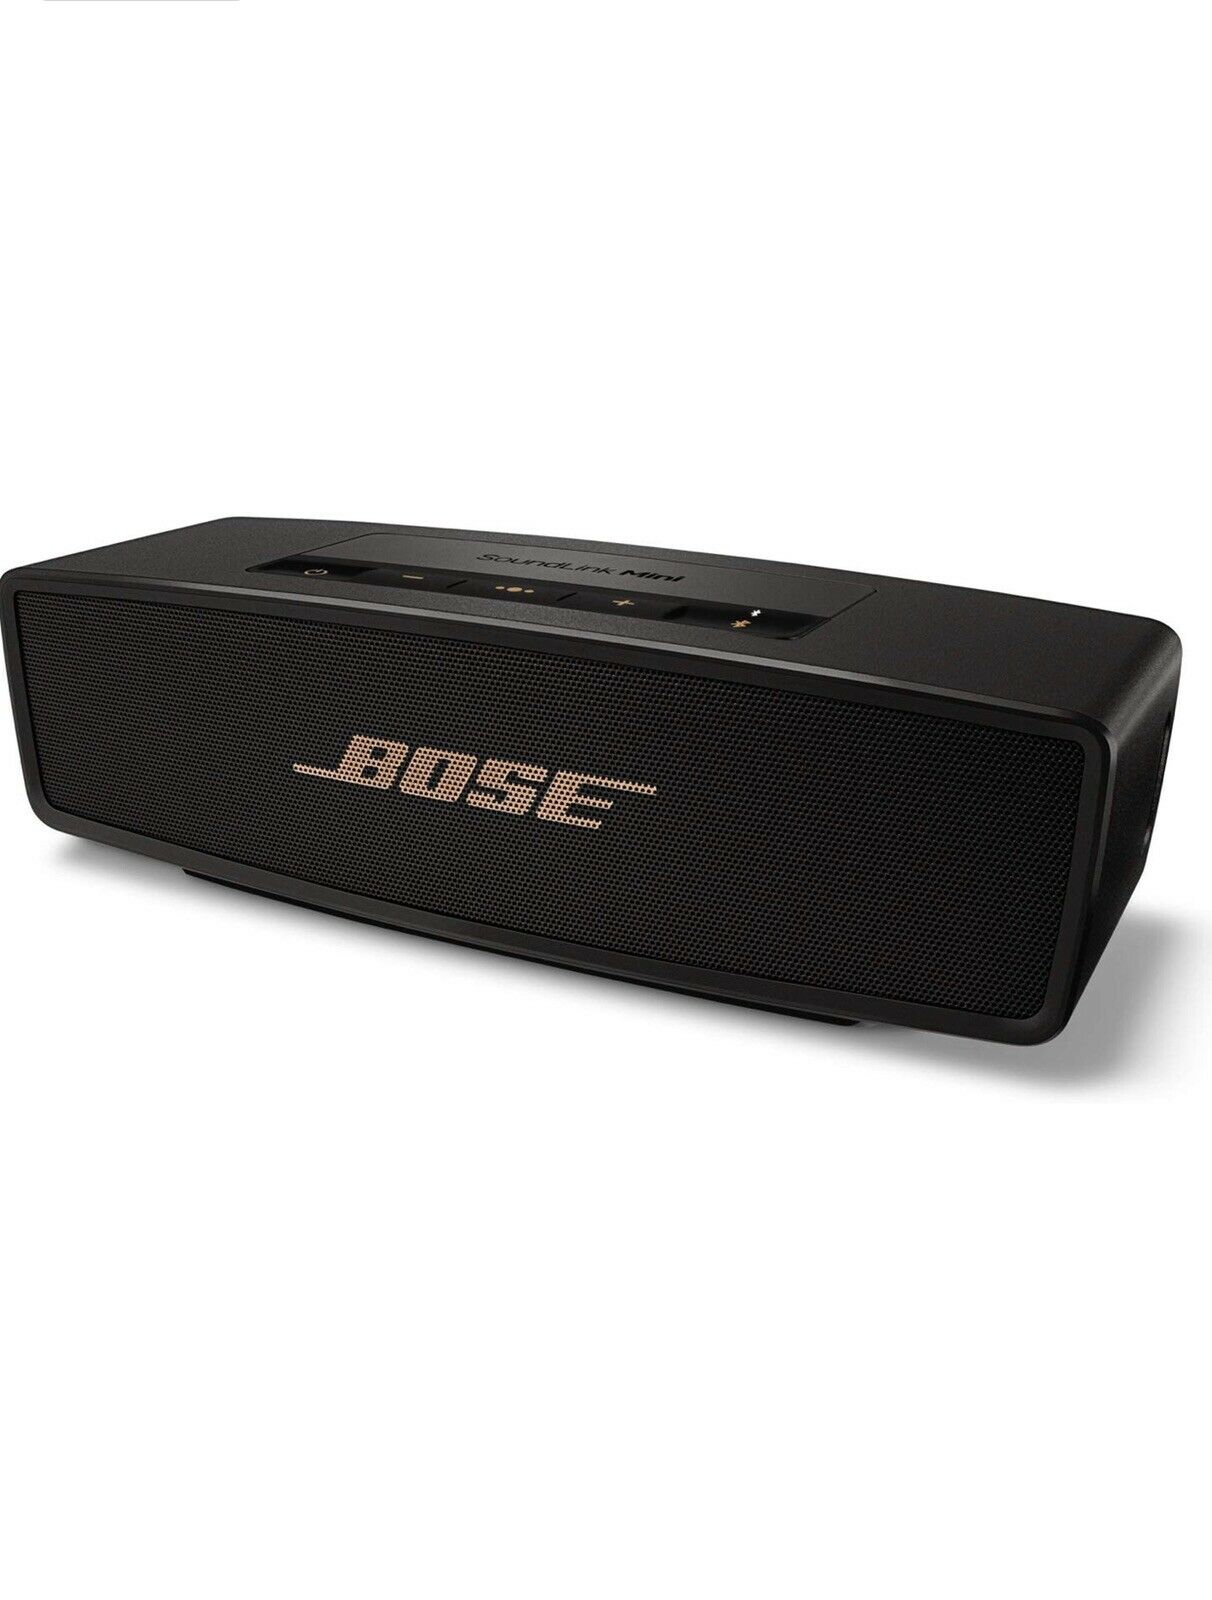 Bose SoundLink Mini Series I Bluetooth Speaker No PayPal